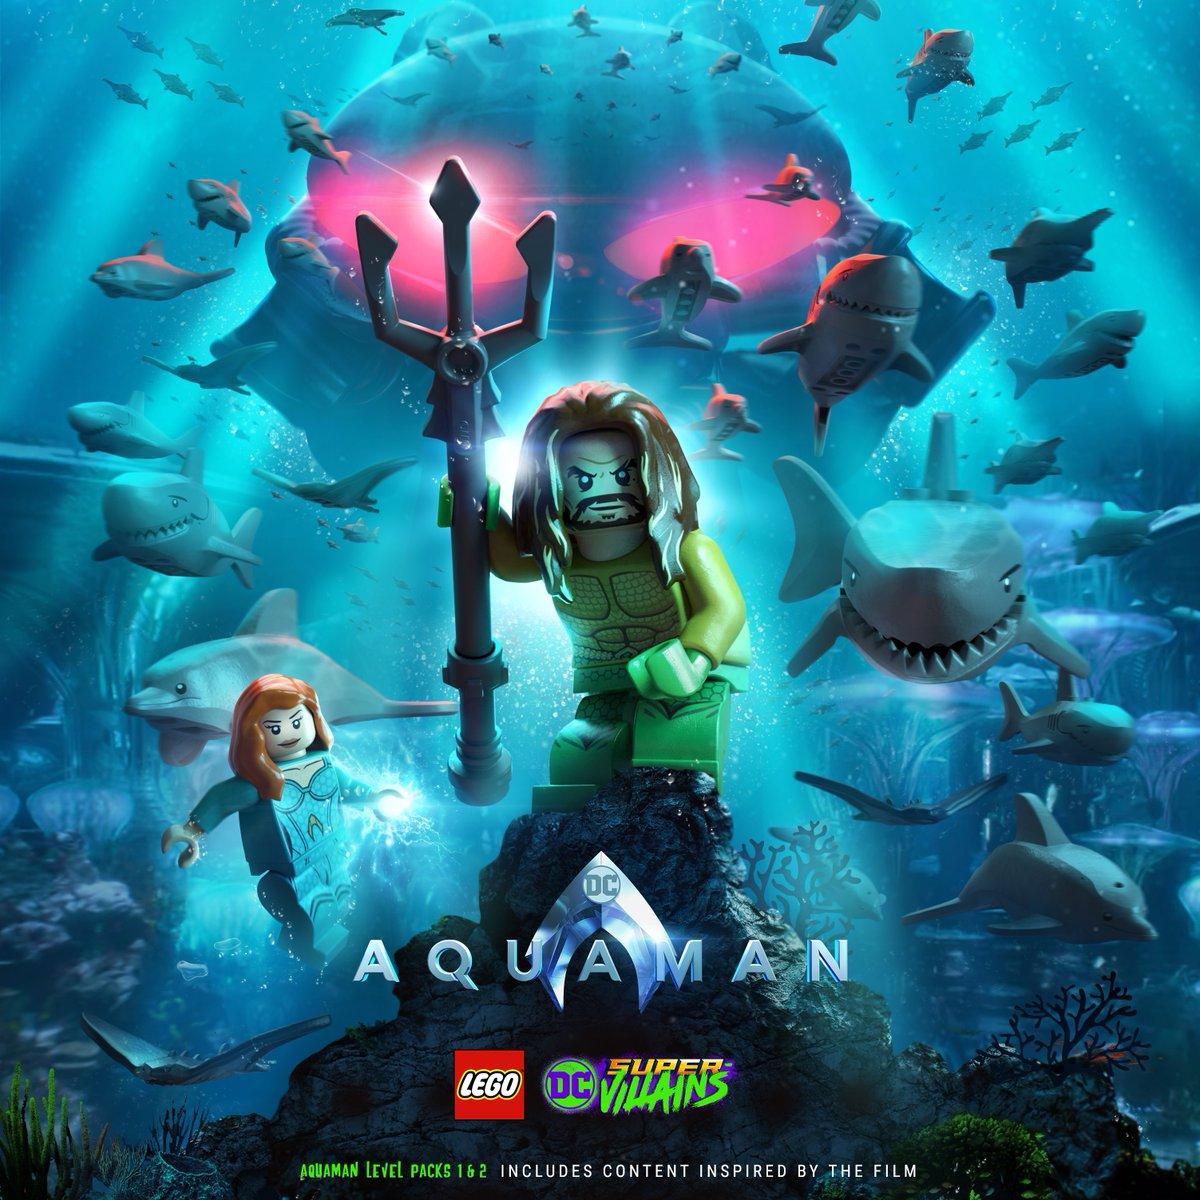 Lego Dc Super Villains Aquaman Movie Dlc Revealed Nintendo Everything